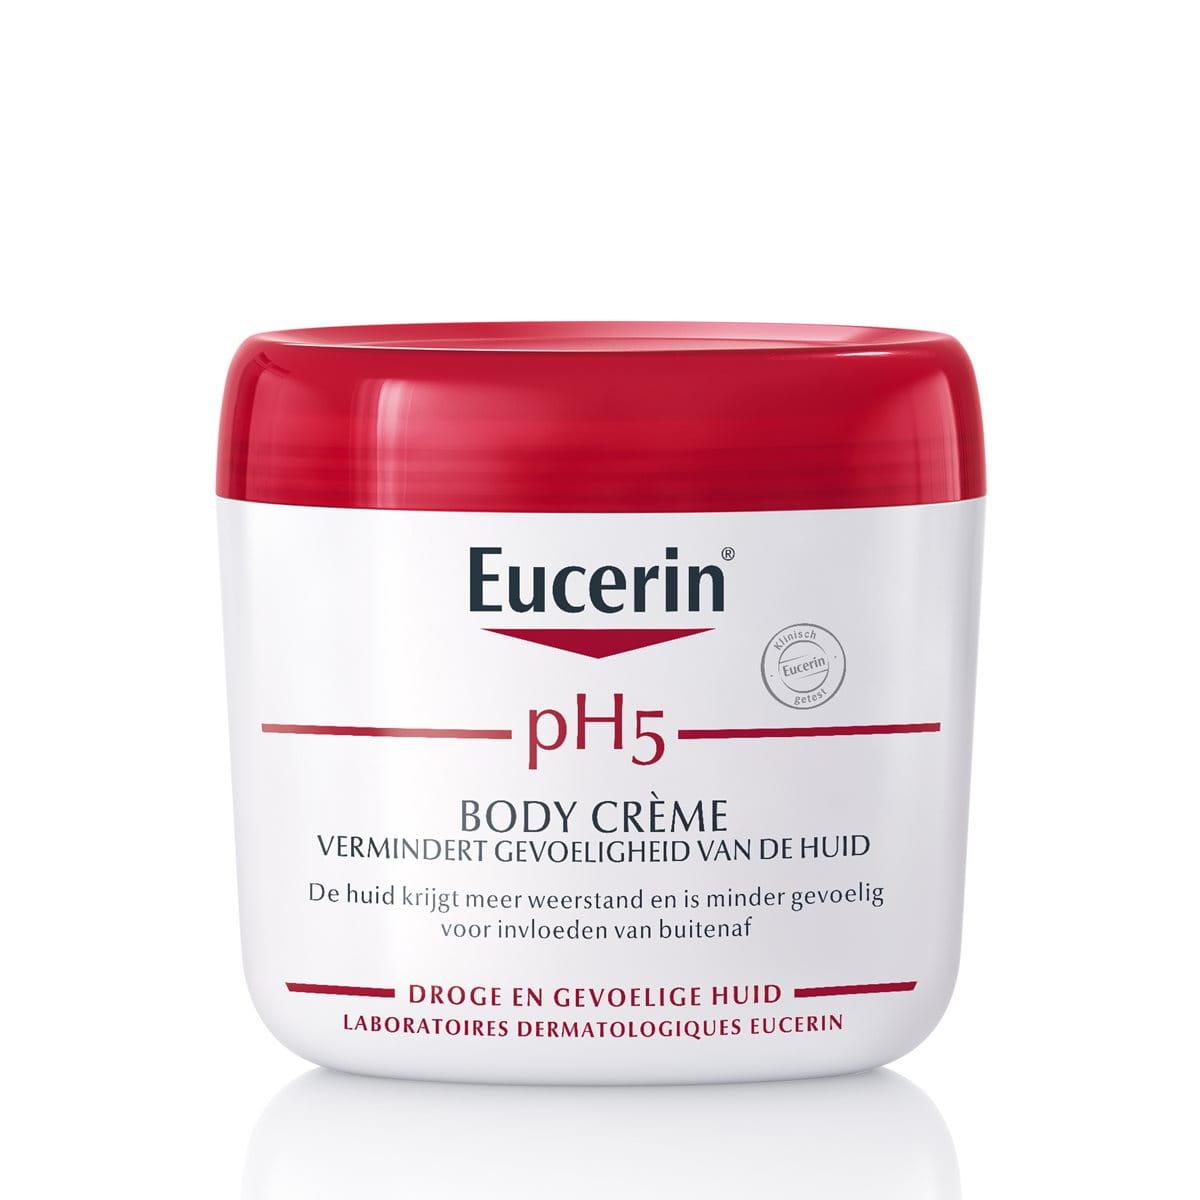 ph5 Soft Body Crème packshot | Eucerin